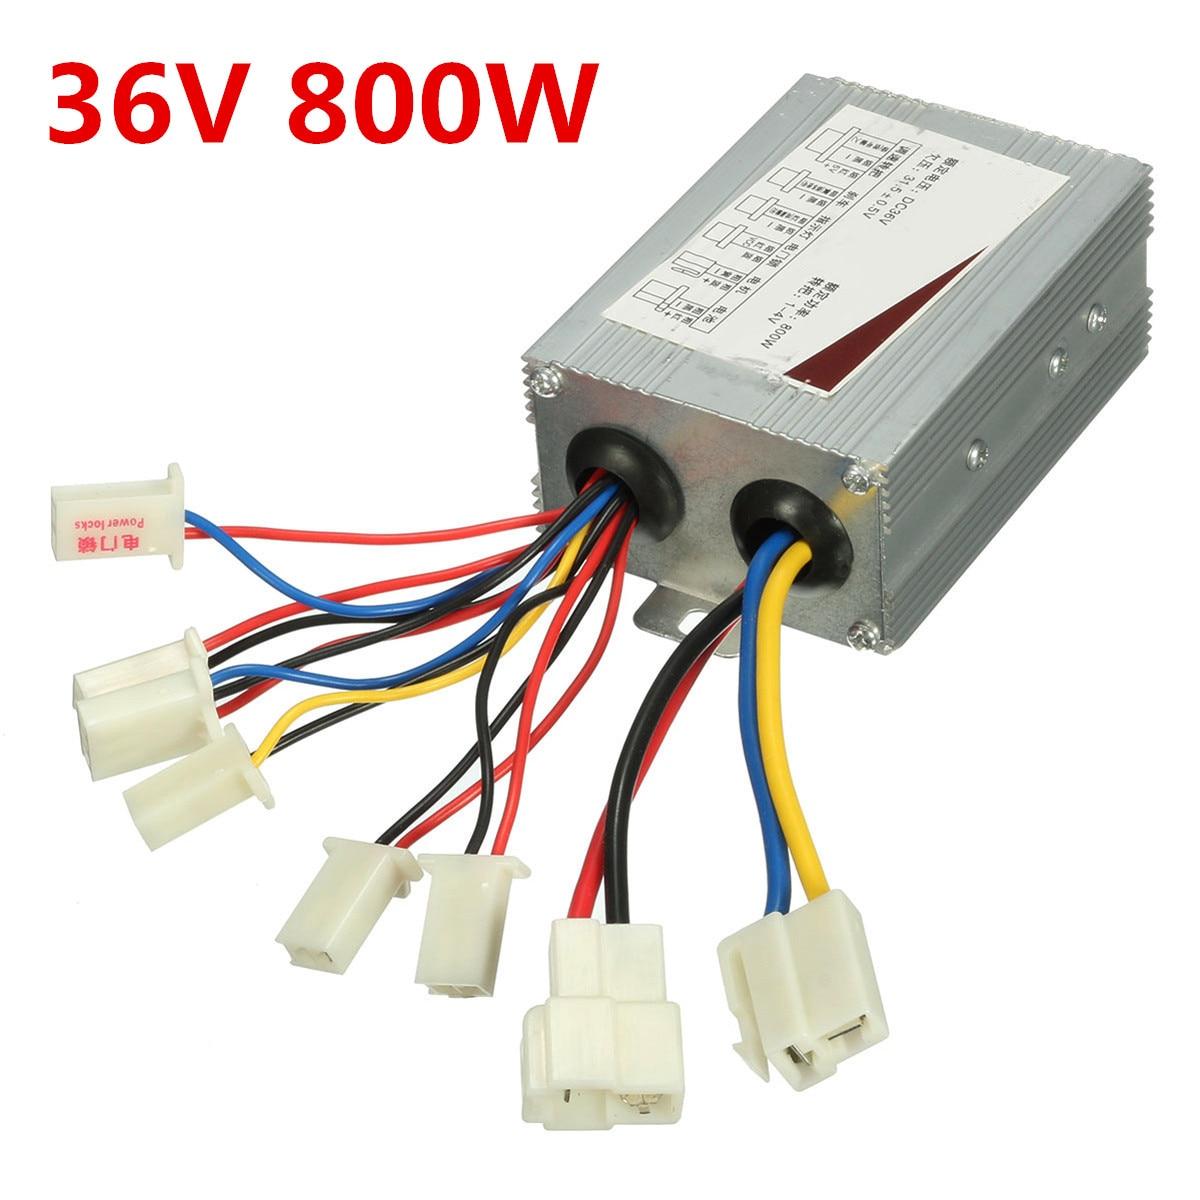 36V 800W DC Brush, controlador de velocidad del Motor para bicicleta eléctrica, Scooter, accesorios para bicicletas eléctricas